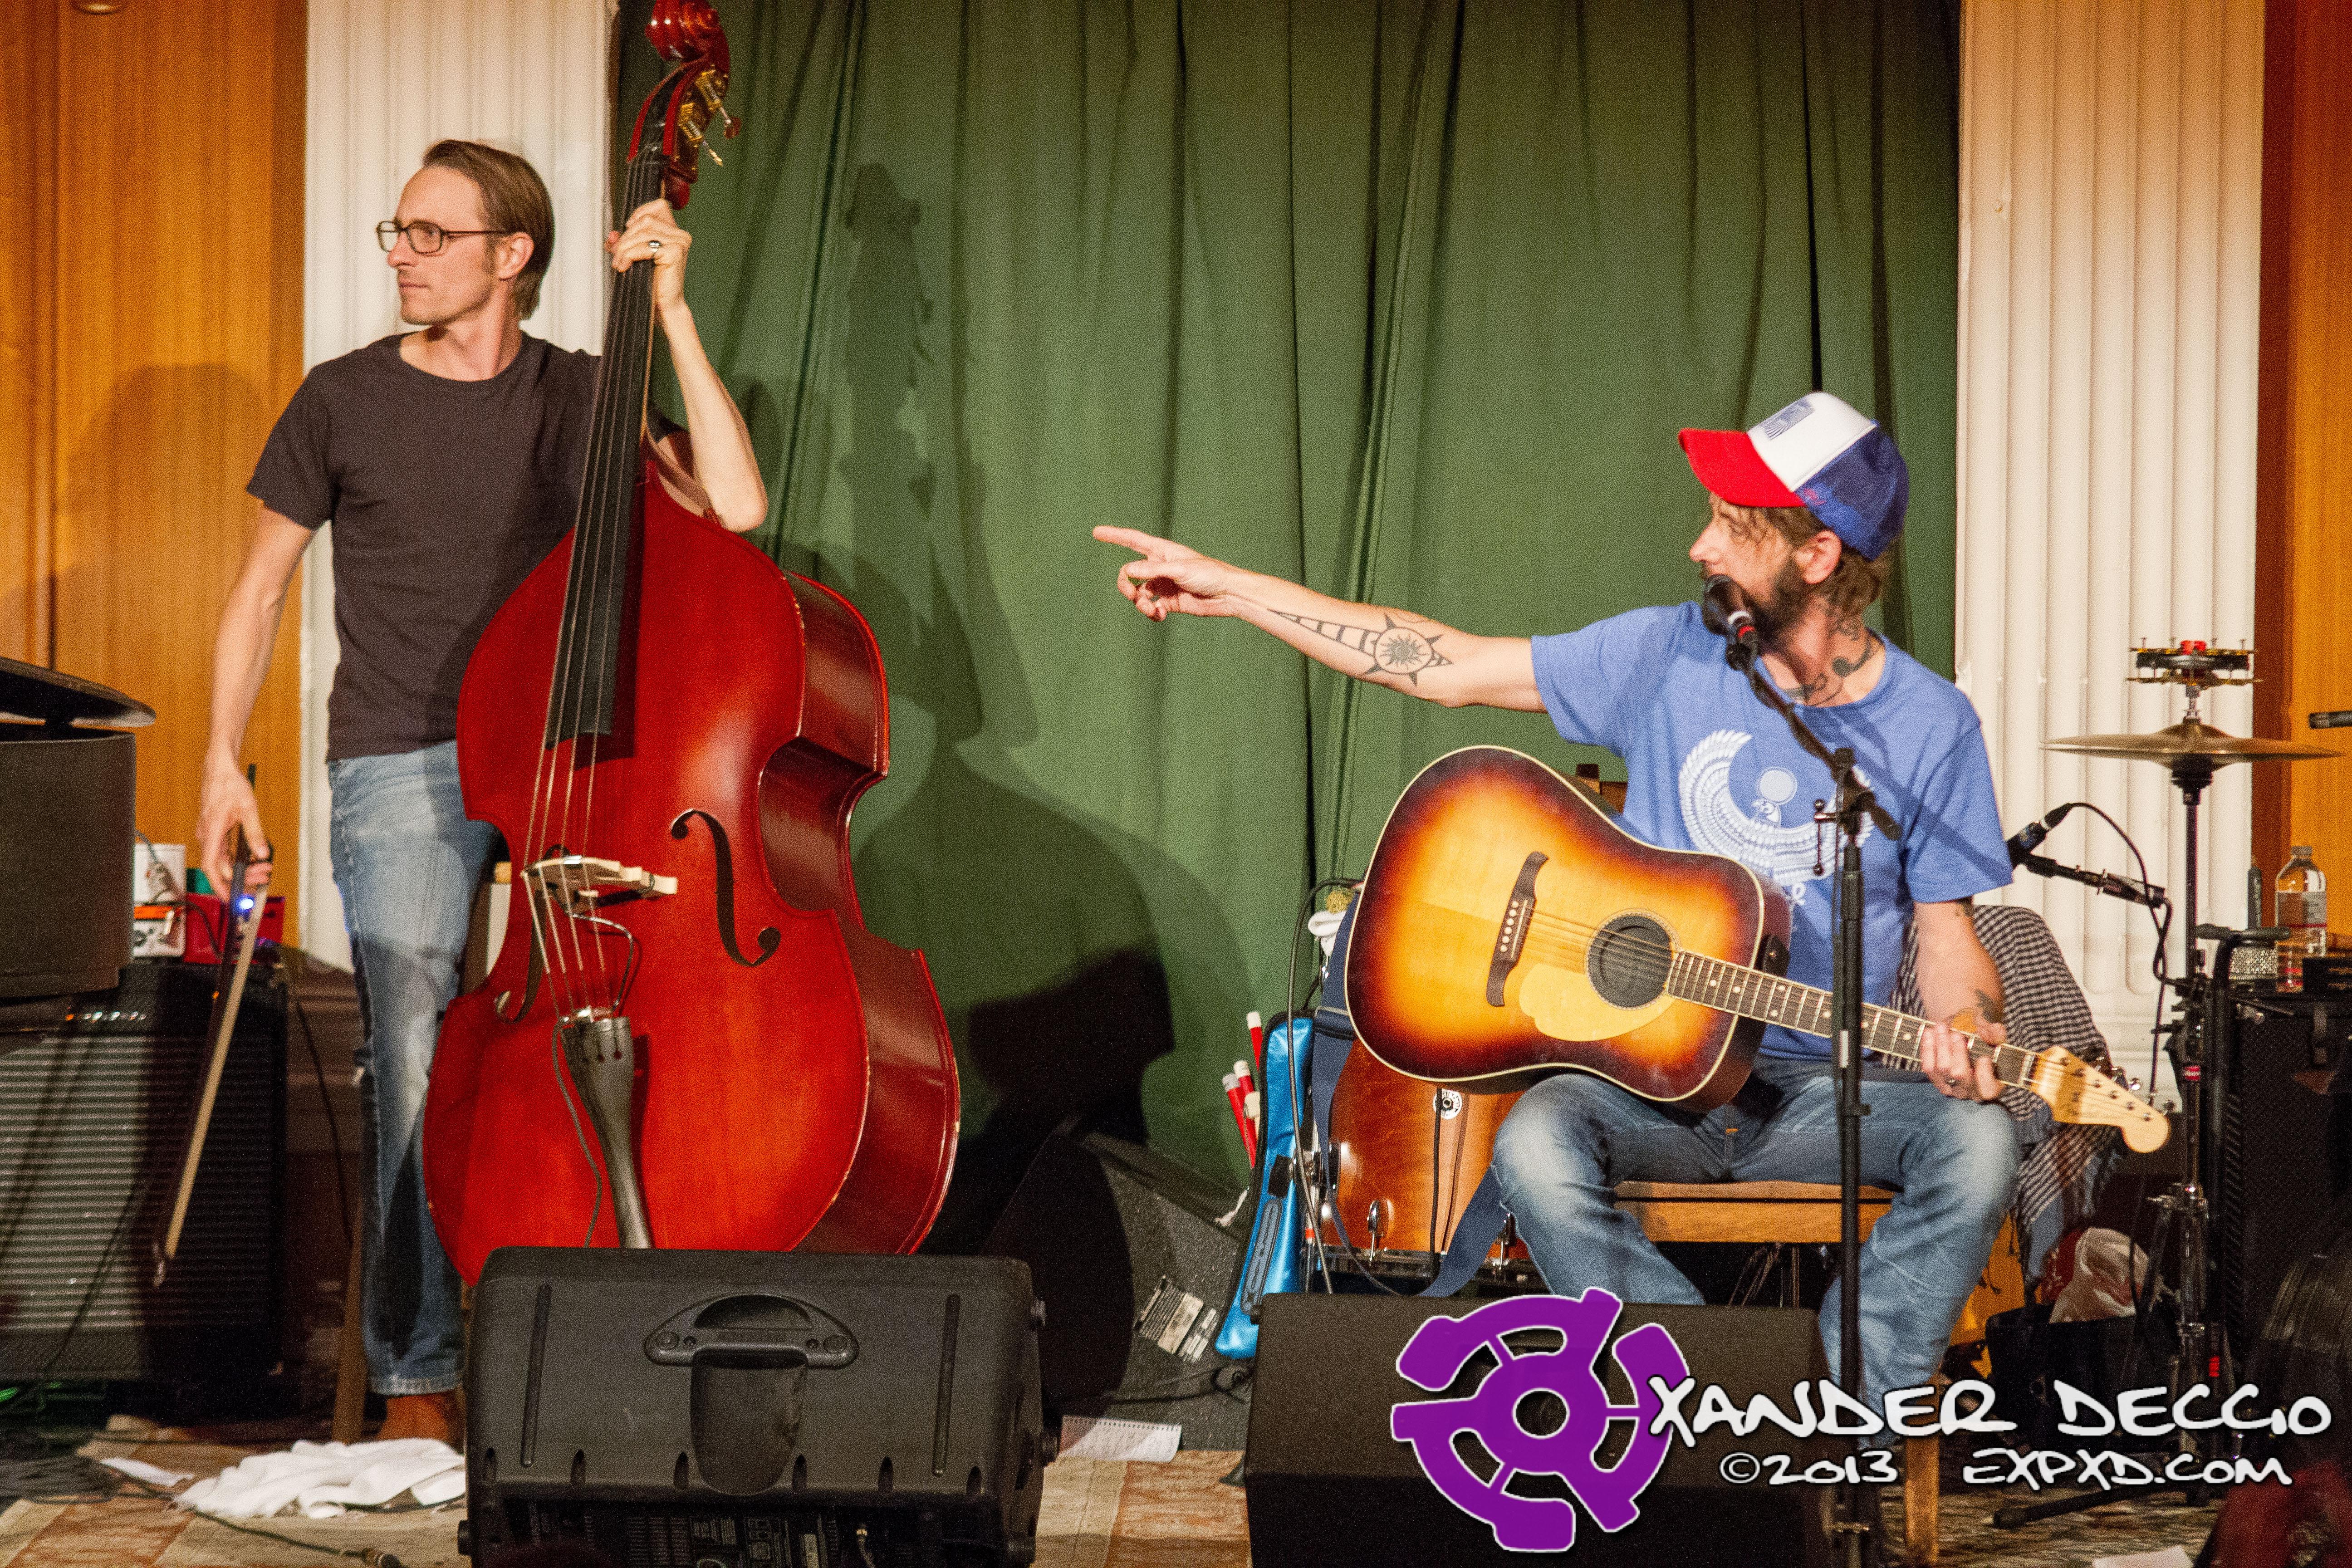 Band of Horses and Sera Cahoone Live @ The Seasons Performance Hall (Photo by Xander Deccio)